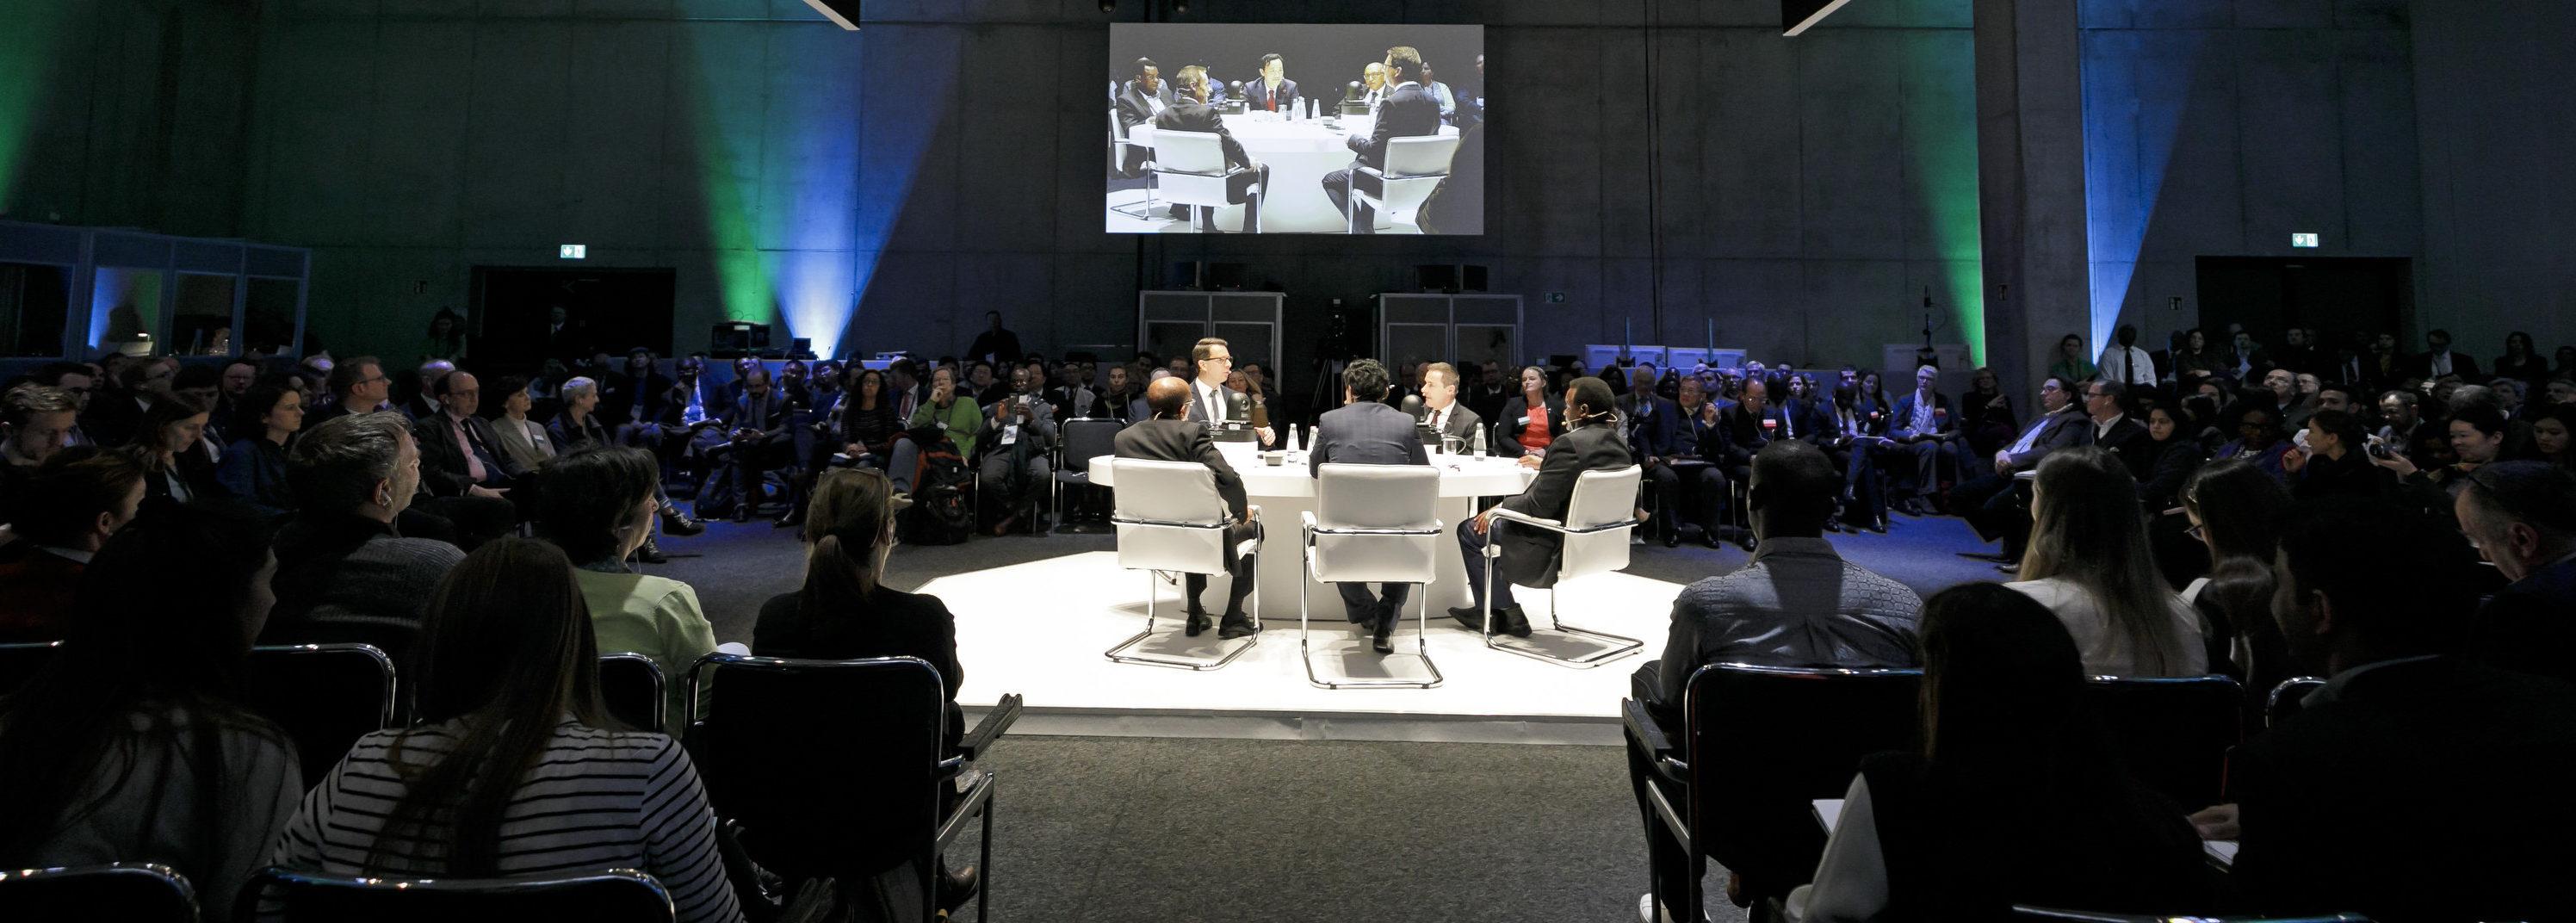 GFFA 2020 | Auftaktveranstaltung 2020